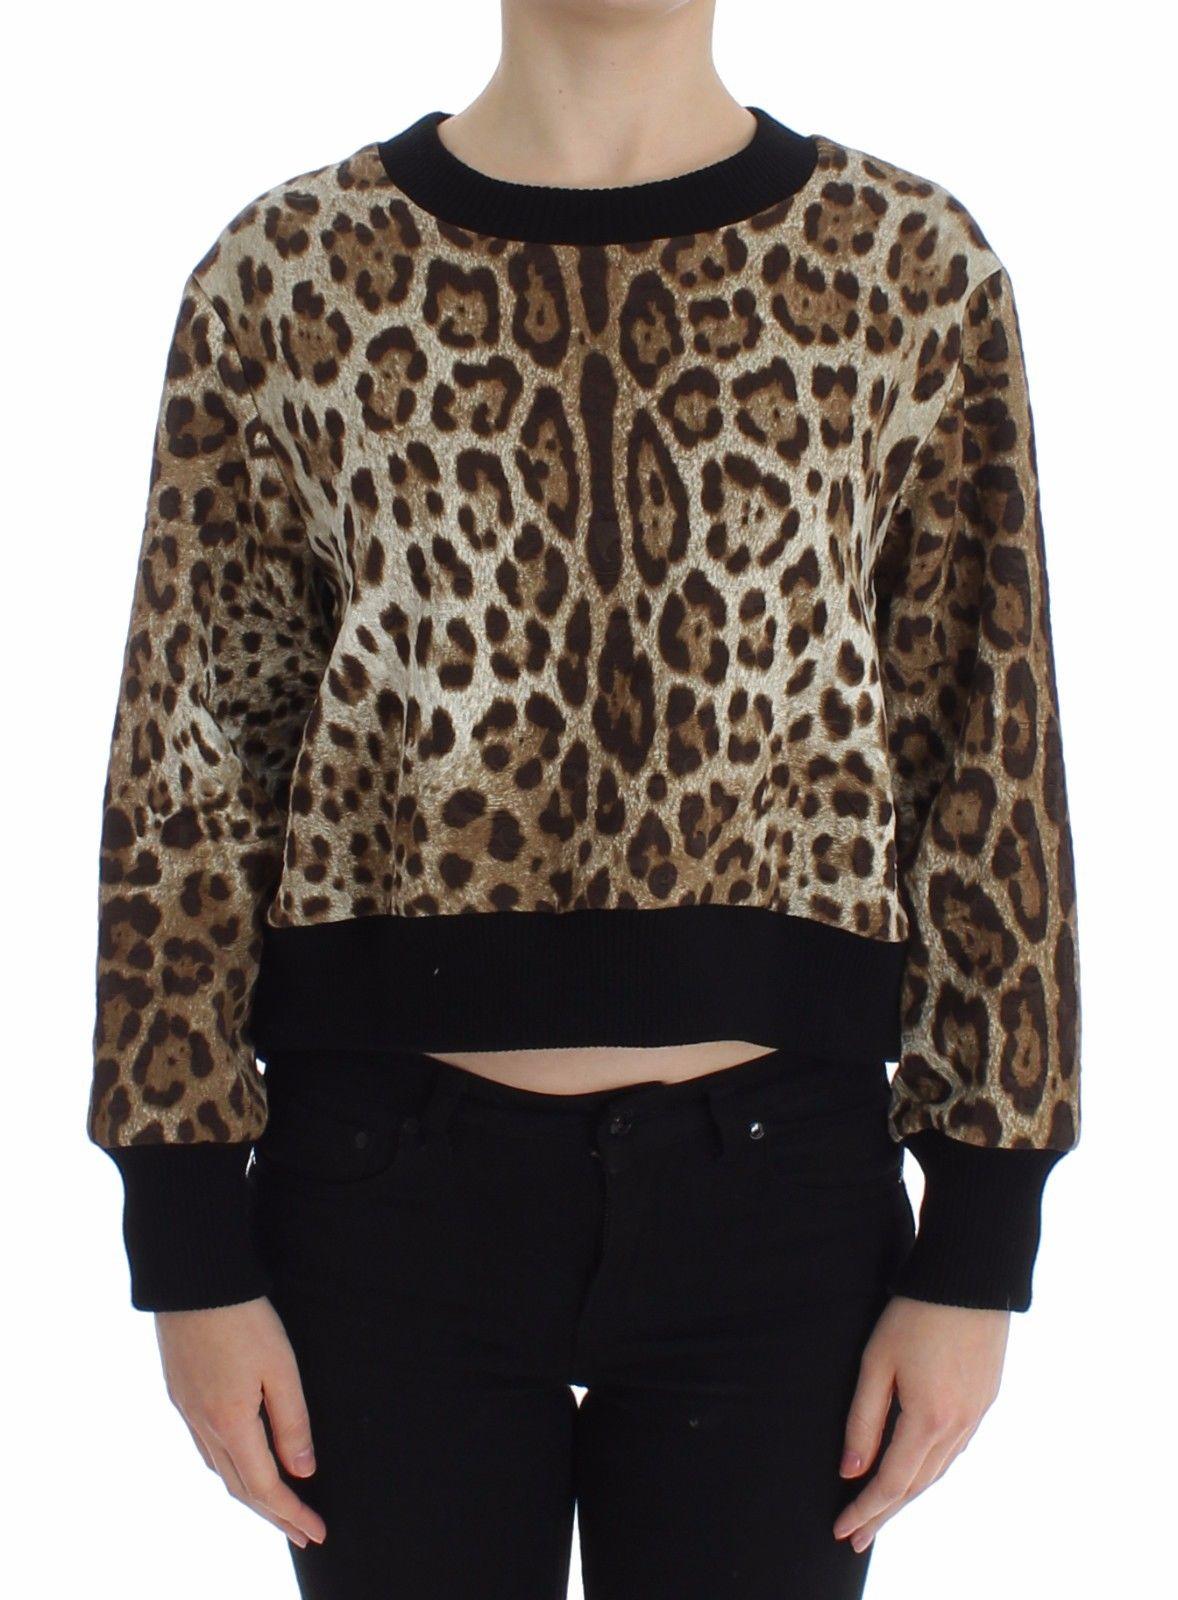 Dolce & Gabbana Women's Leopard Print Crewneck Short Sweater Brown SIG13185 - IT44 L